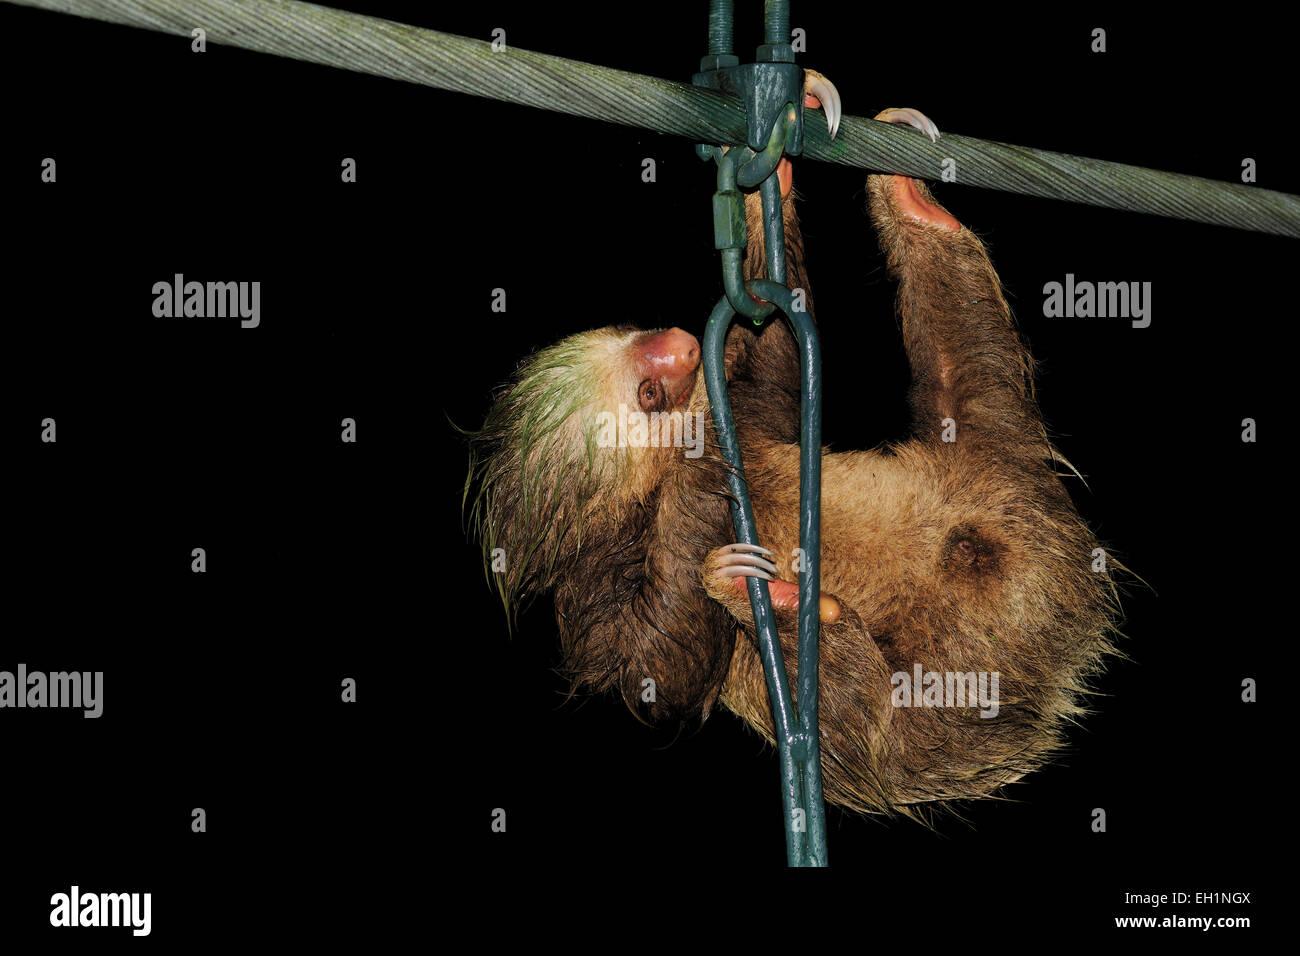 Three-Toed Sloth (Bradypus variegatus) using a bridge to gross a river, La Selva Biological Station, Costa Rica - Stock Image